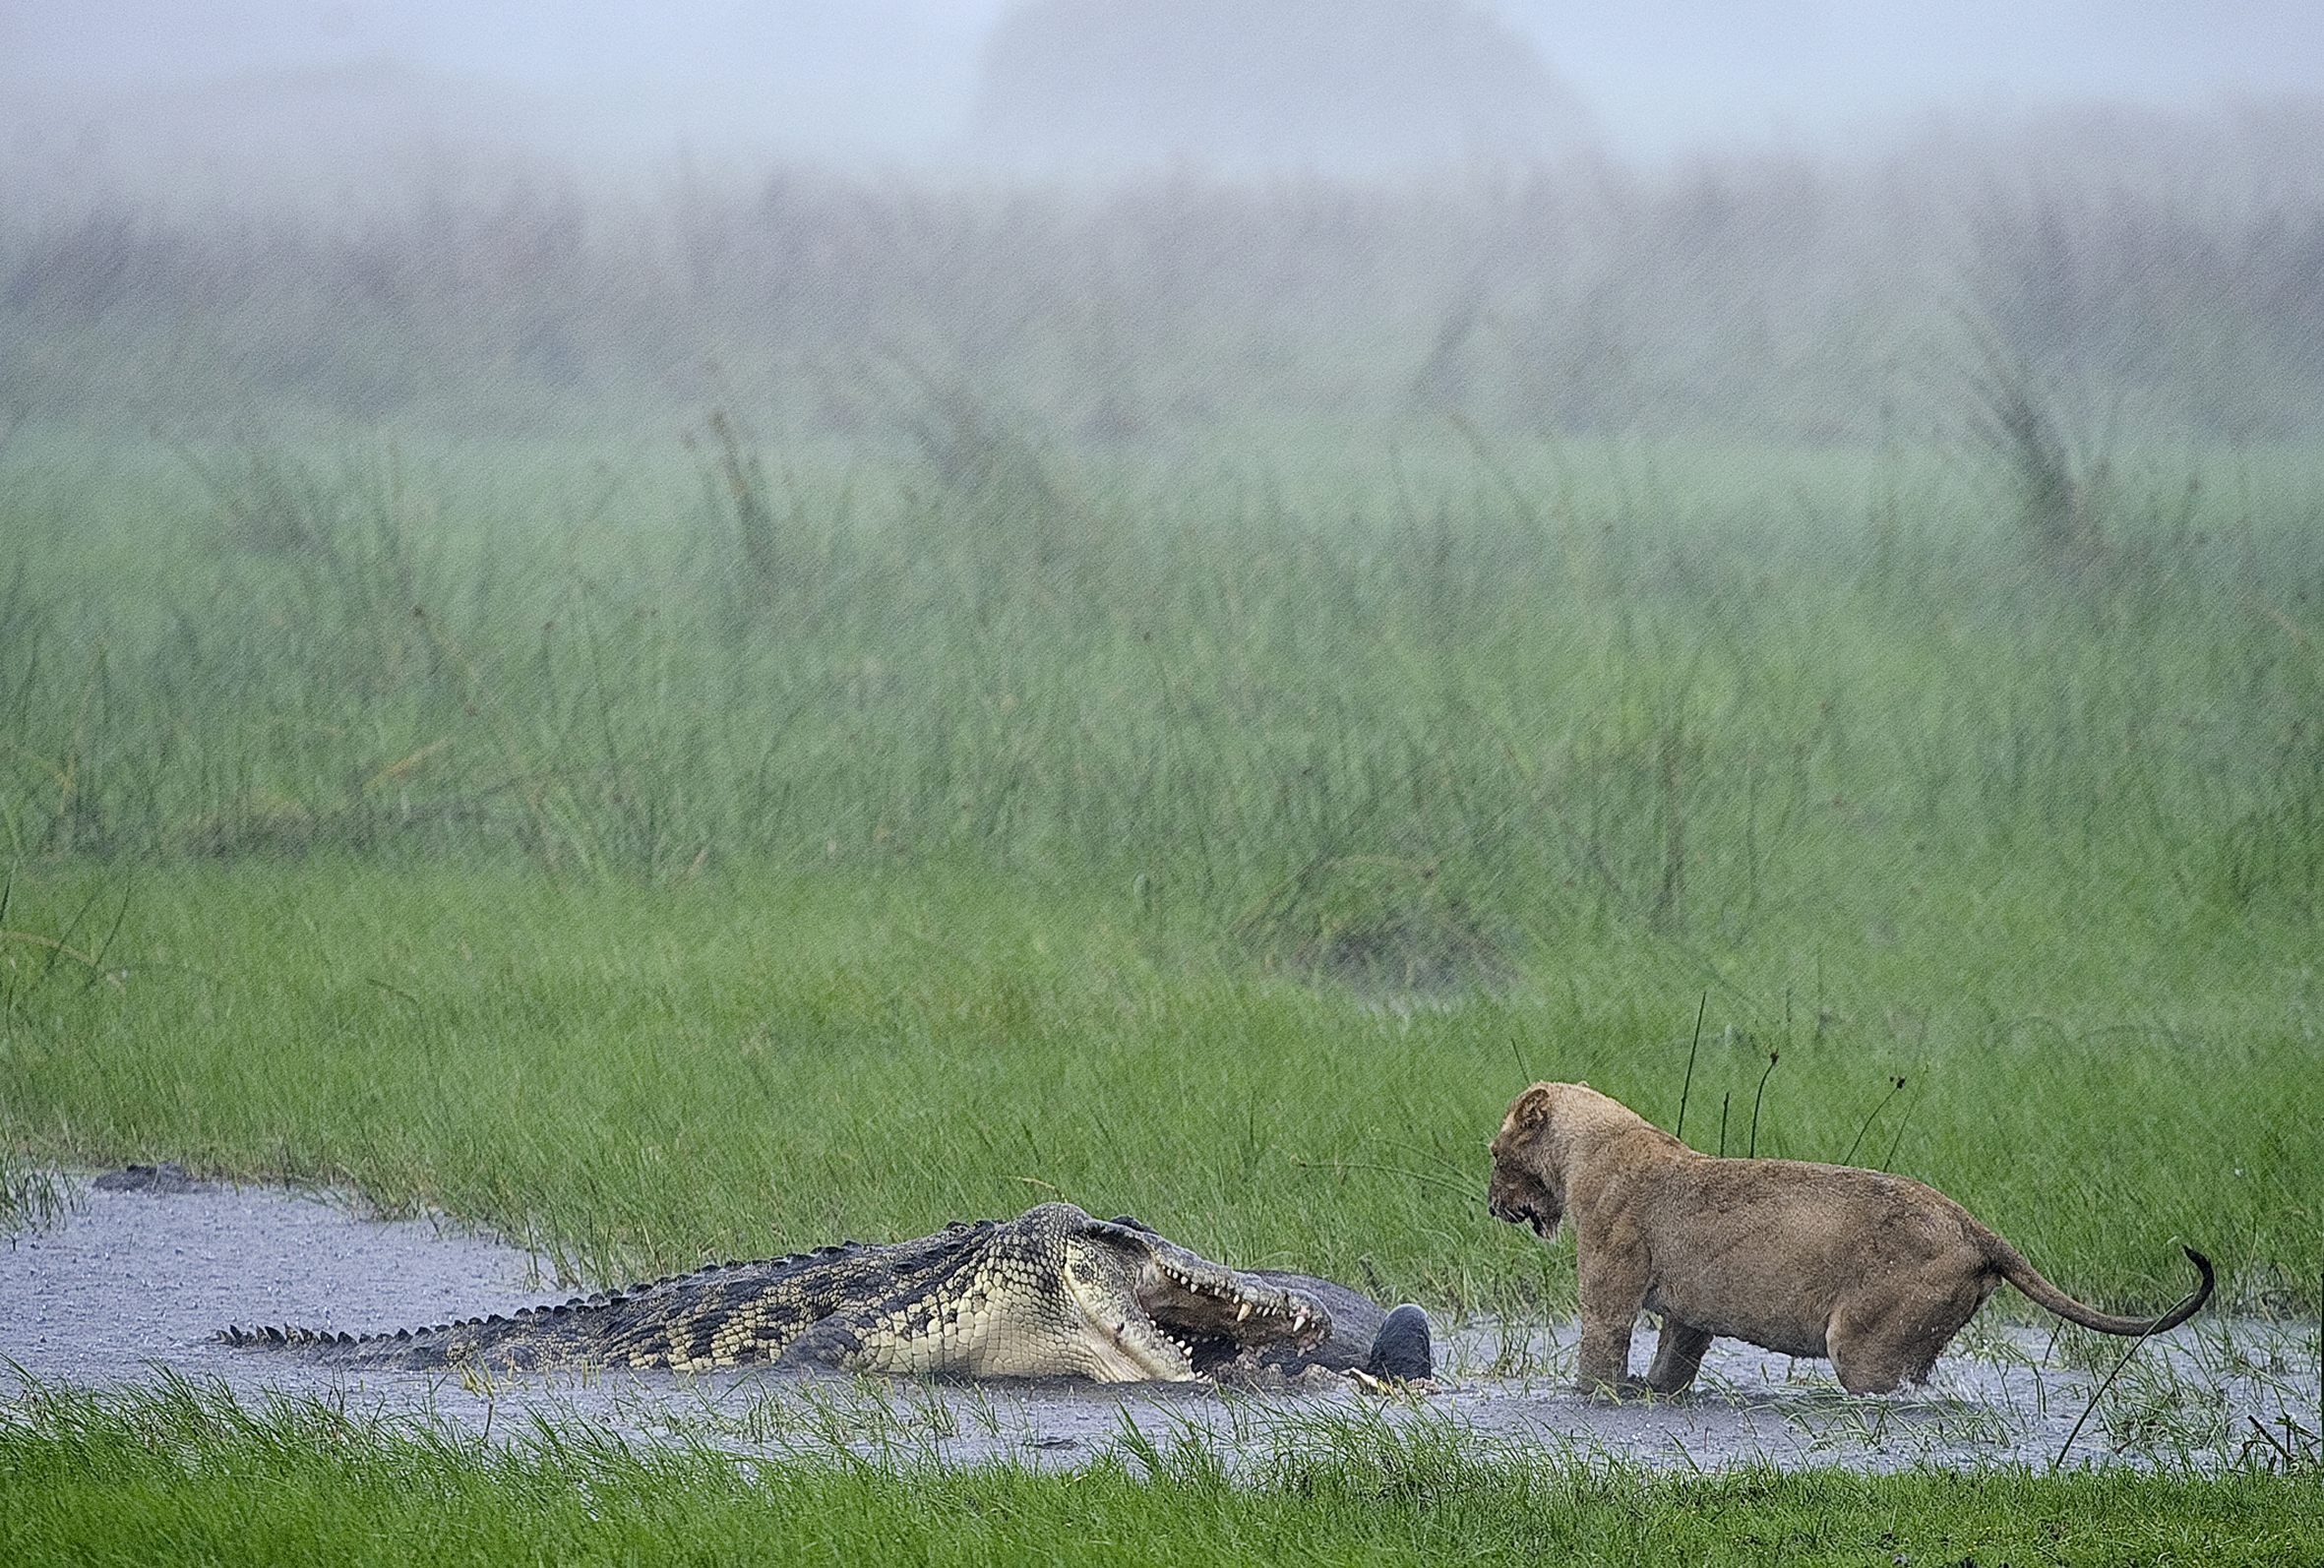 Foto realizada no Delta do Okavango, na África, por Sergey Gorshkov (Foto: Sergey Gorshkov/BBC)